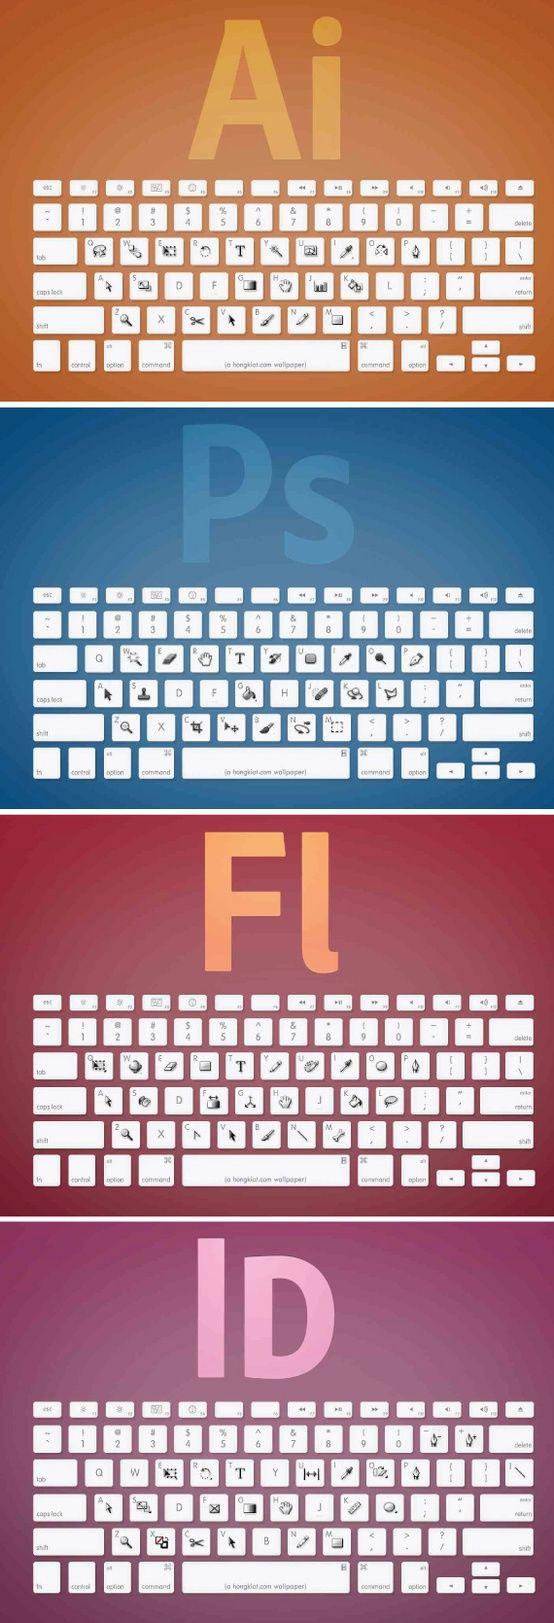 Adobe Shortcuts